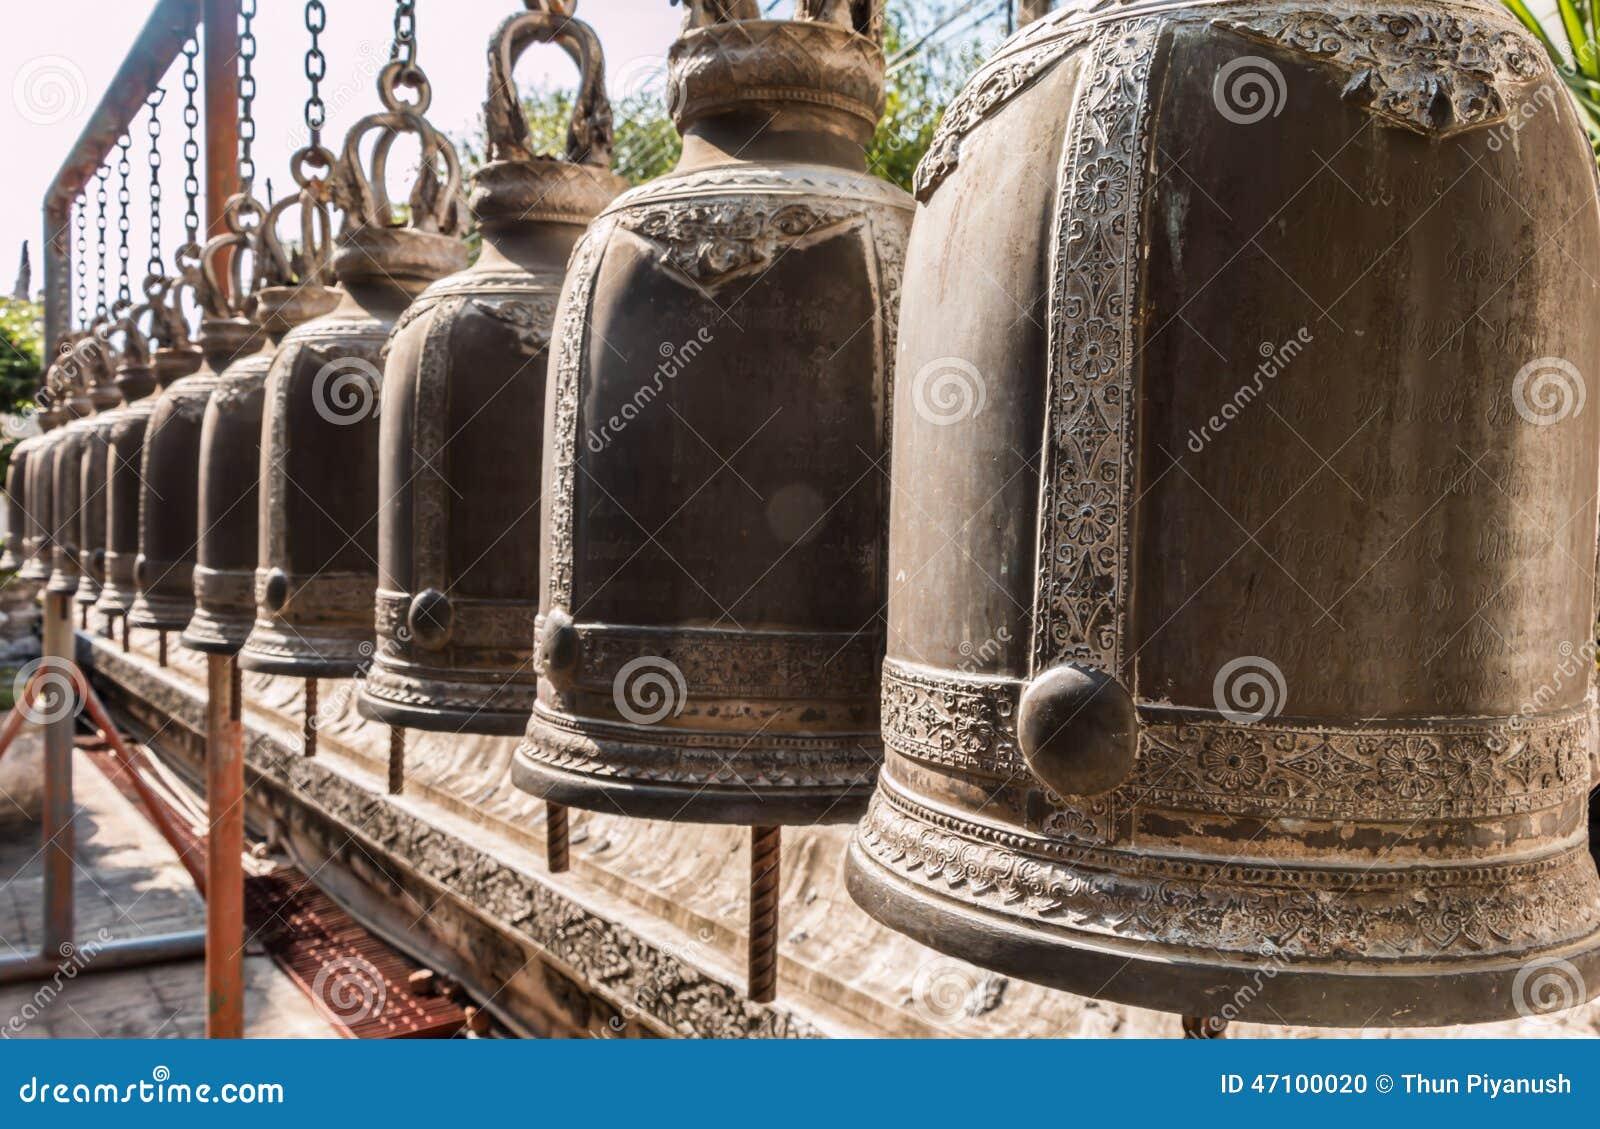 Thailand, Bangkok, Tempel Phananchoeng Worawihan, altes religiöses